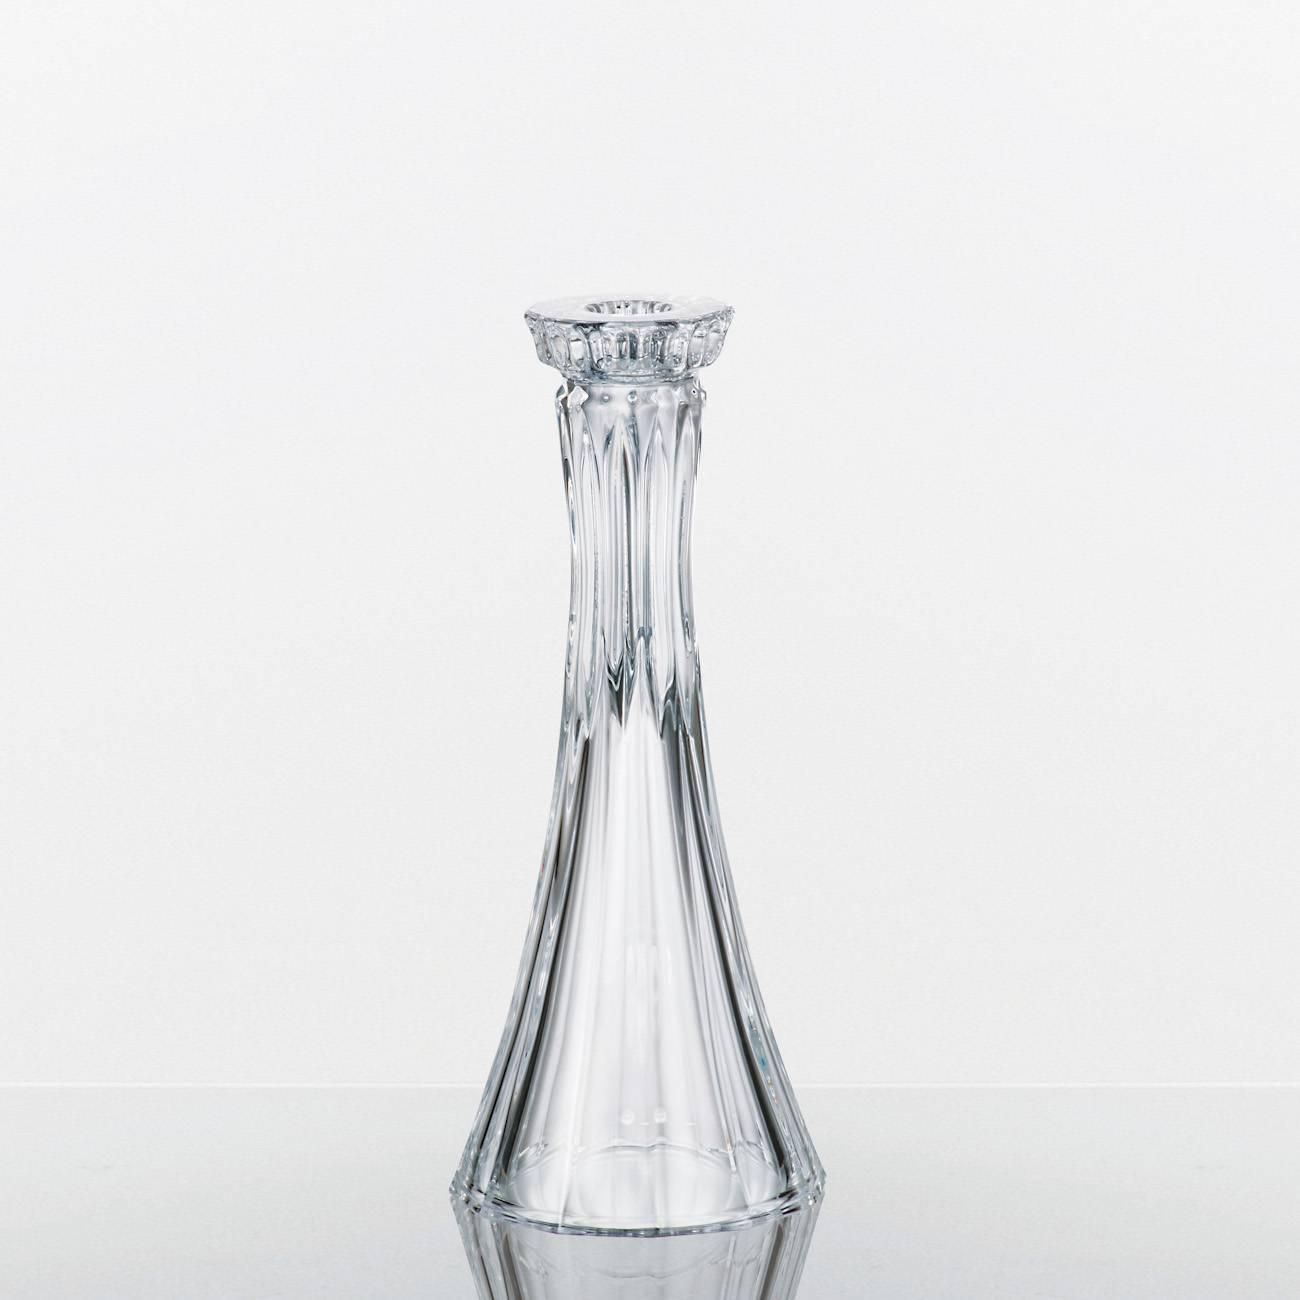 Castiçal Wellington Transparente em Cristal - Bohemia Crystalite - 25,5x9,5 cm